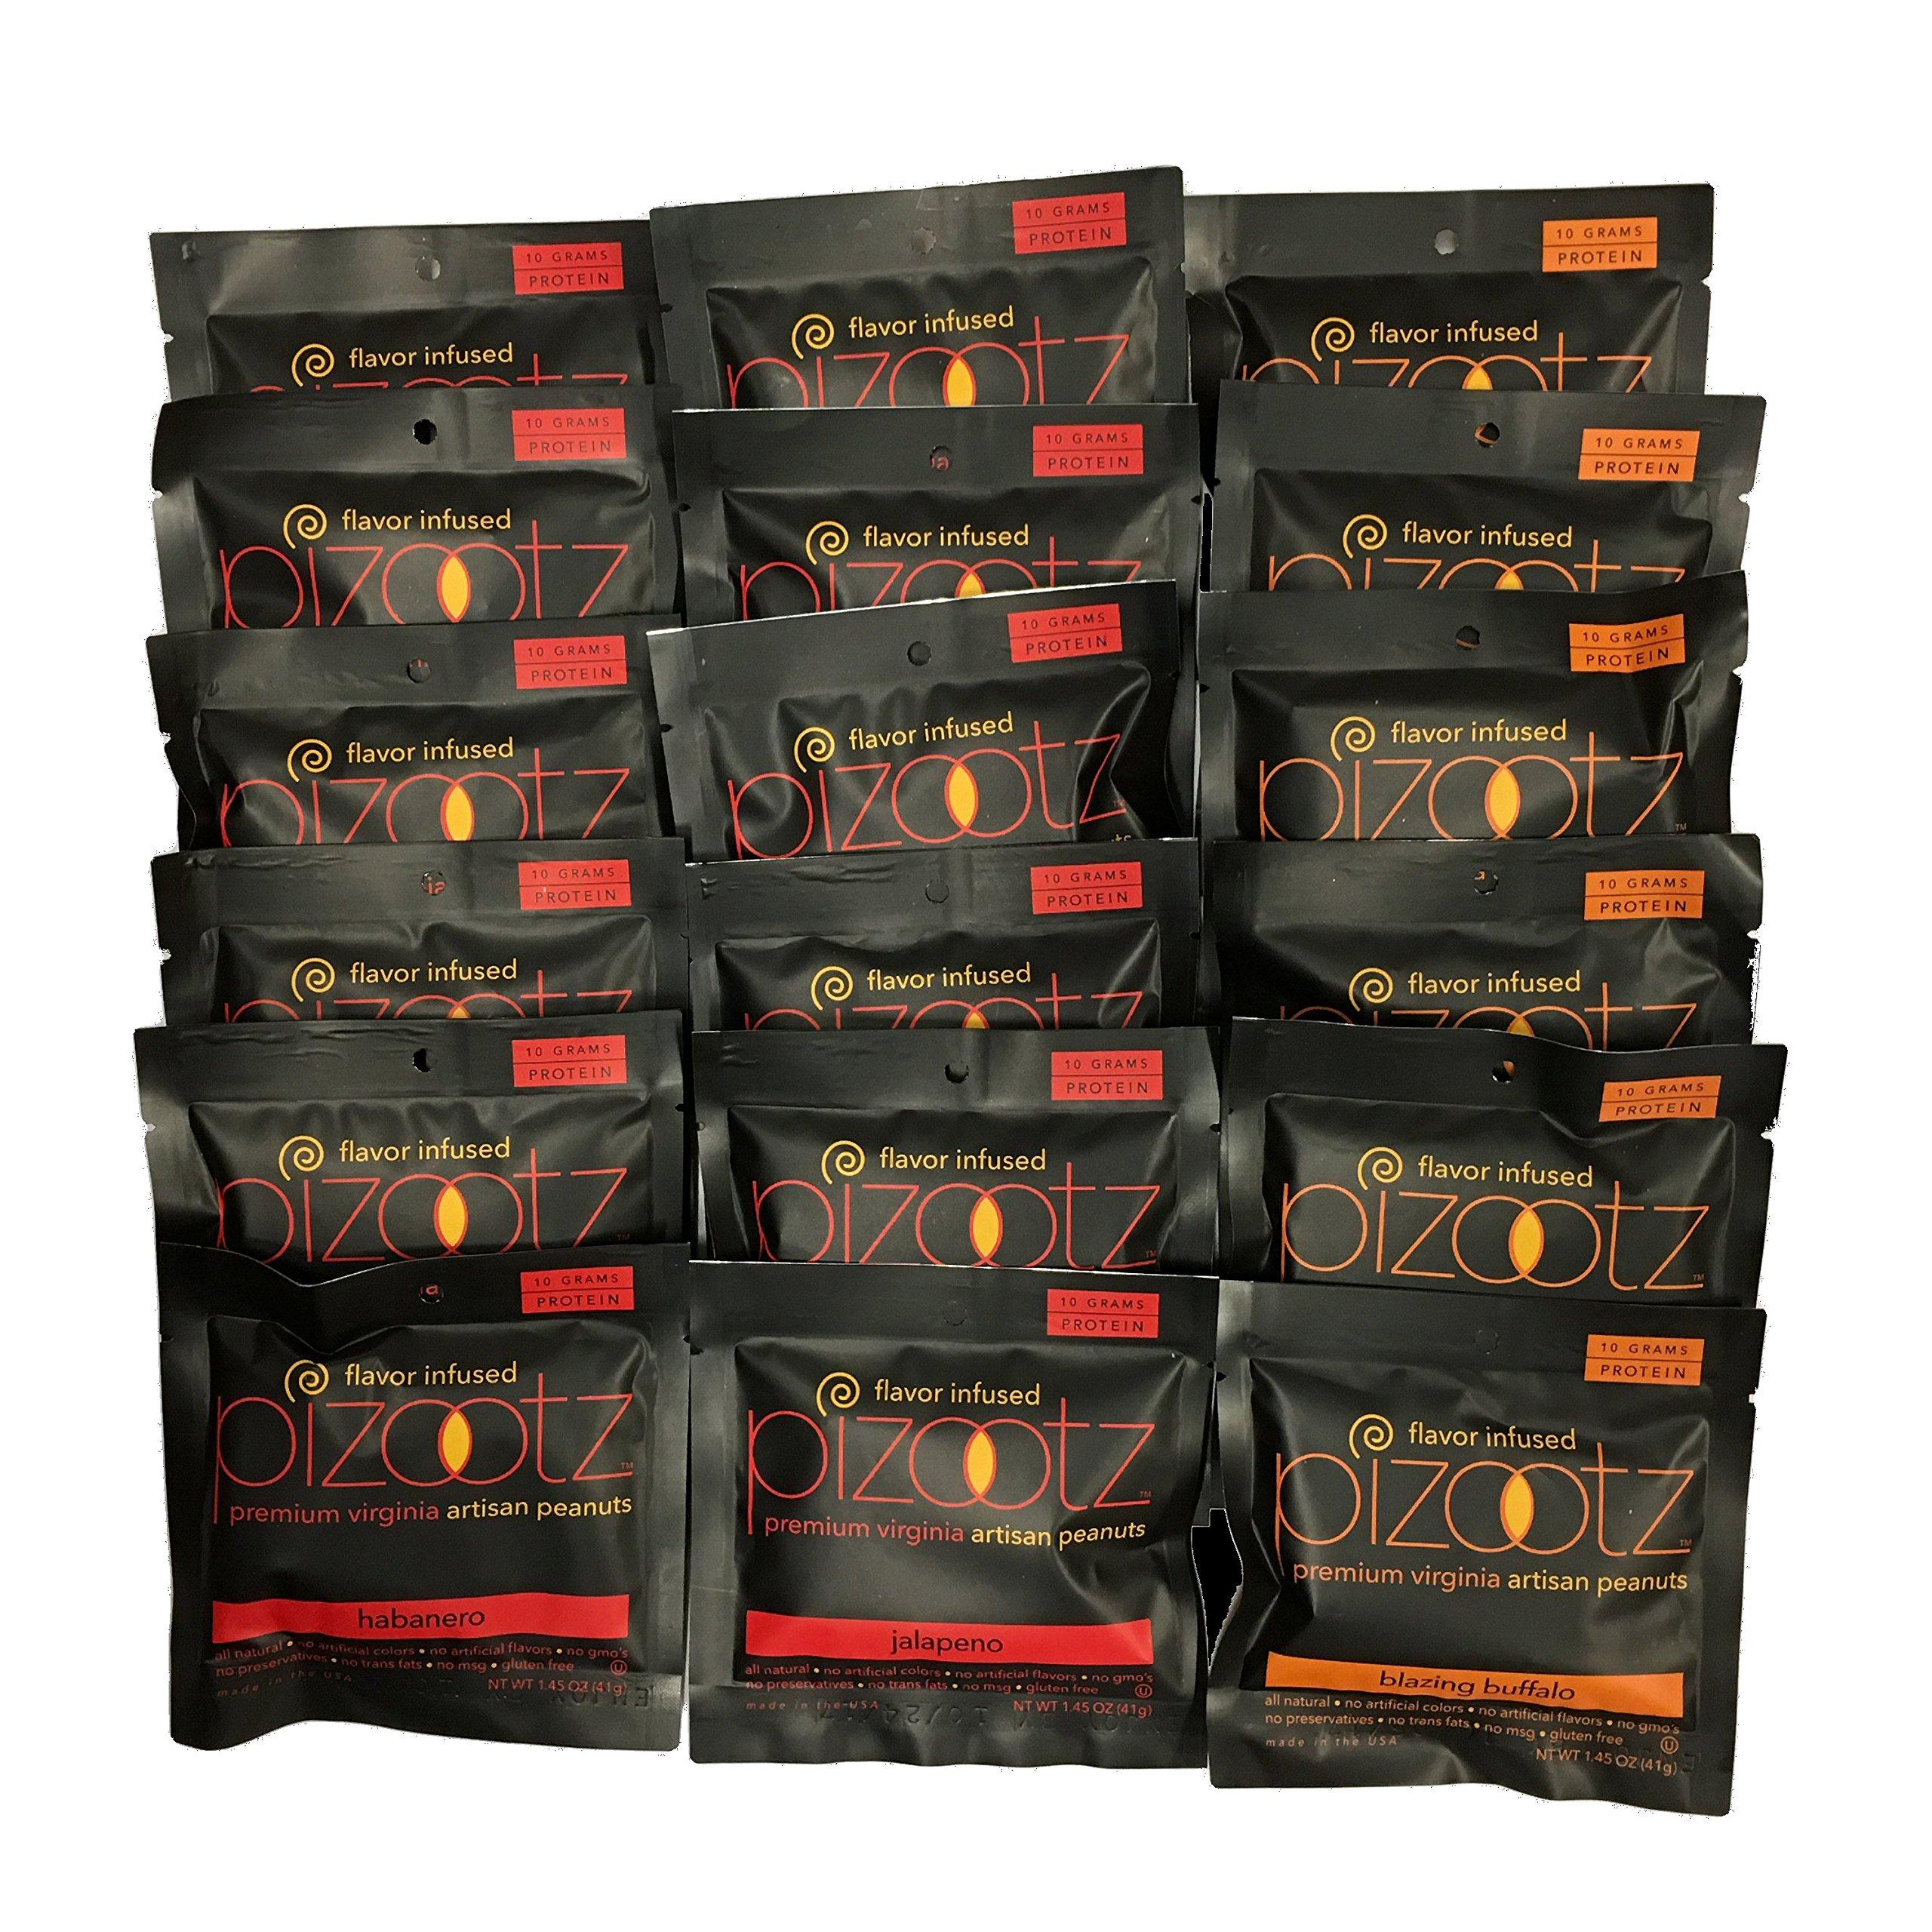 Pizootz Heat Variety Pack- 6 each 1.45 oz Jalapeno, Habanero, Blazing Buffalo-Flavor Infused Peanuts-Premium Virginia Gourmet Artisan Vegan Peanuts - (18) 1.45 oz bags …